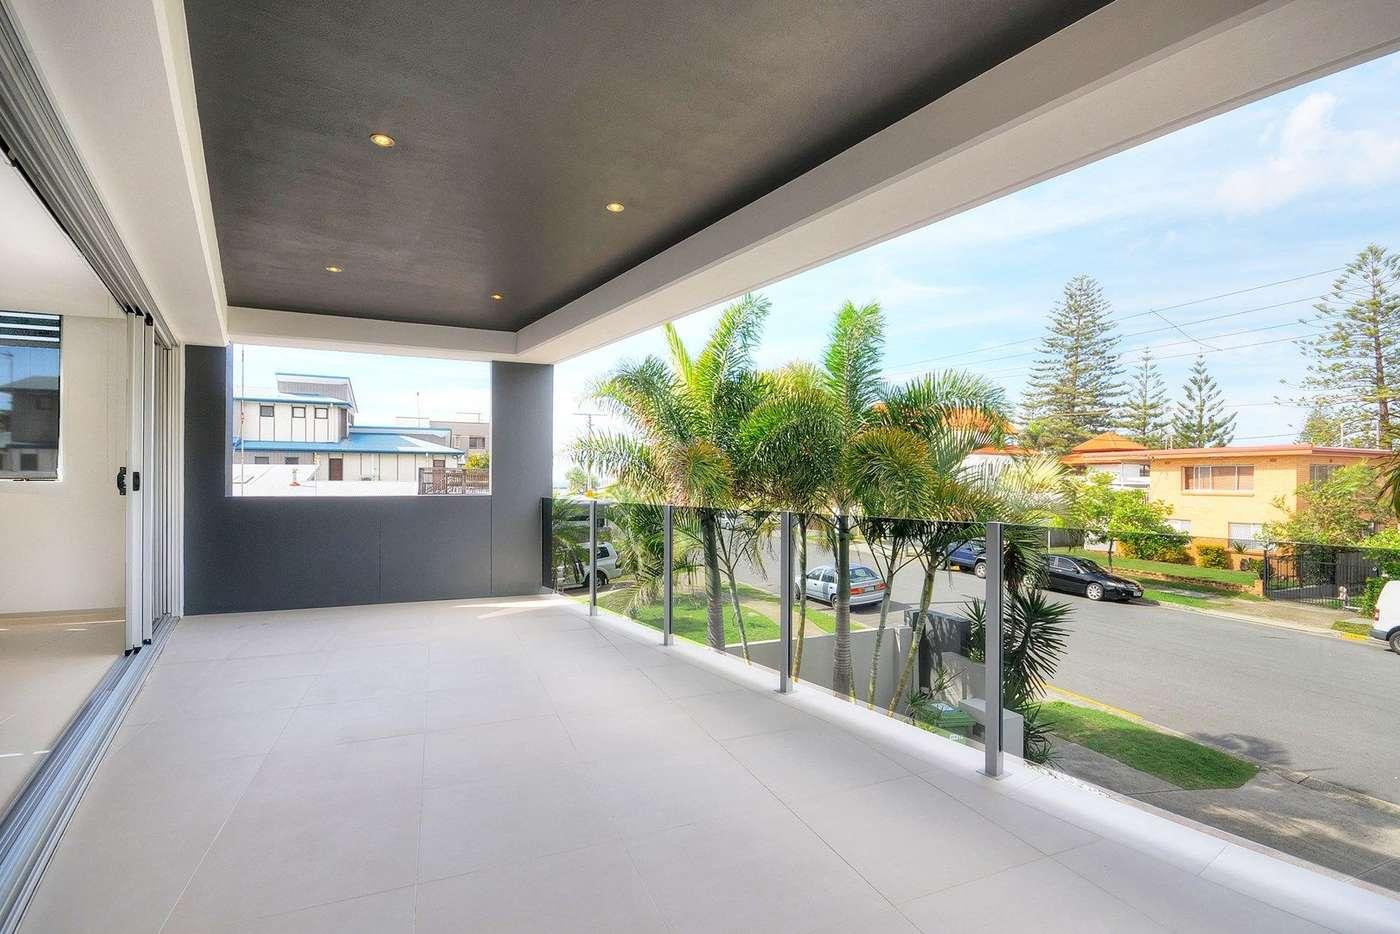 Main view of Homely apartment listing, 2/15 Ventura Road, Mermaid Beach QLD 4218